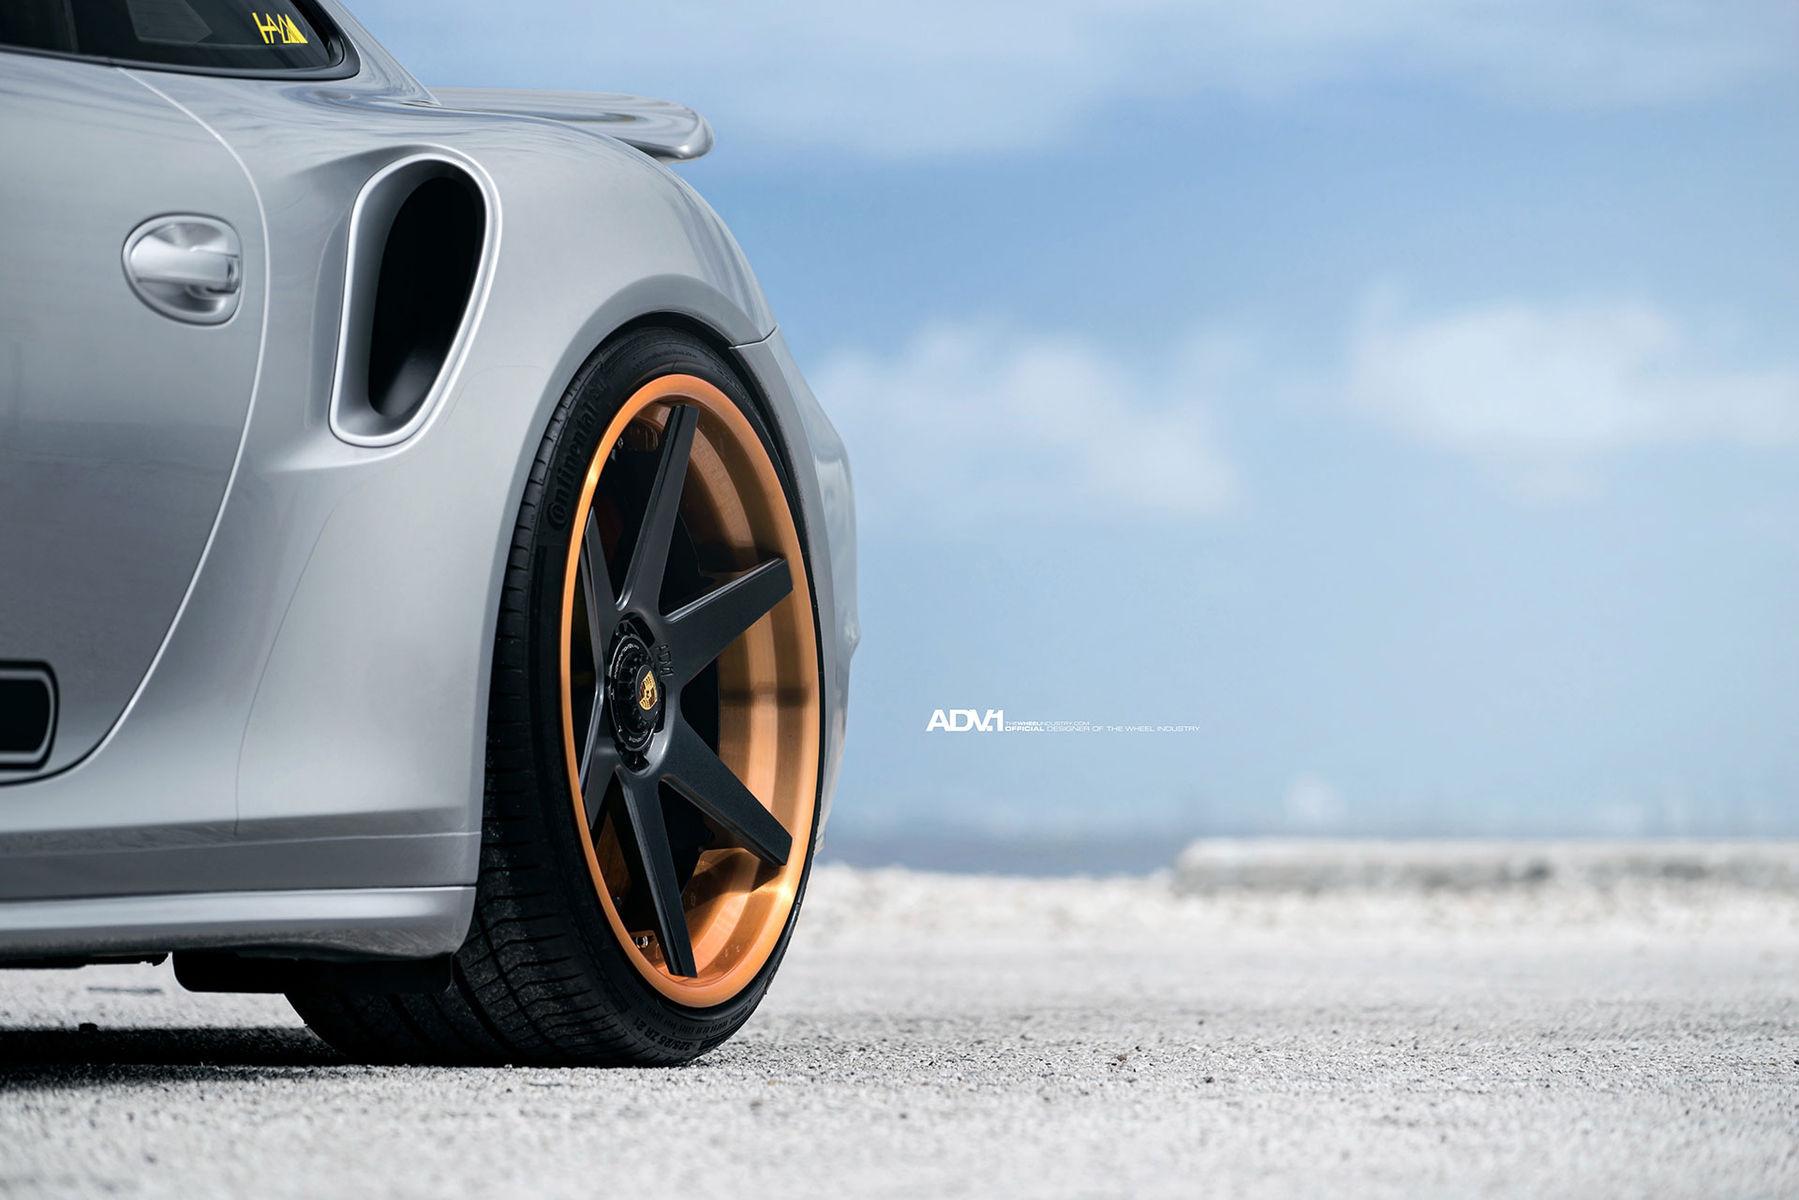 2016 Porsche 911 | Porsche 991 Turbo S - ADV6 Track Spec Standard Series